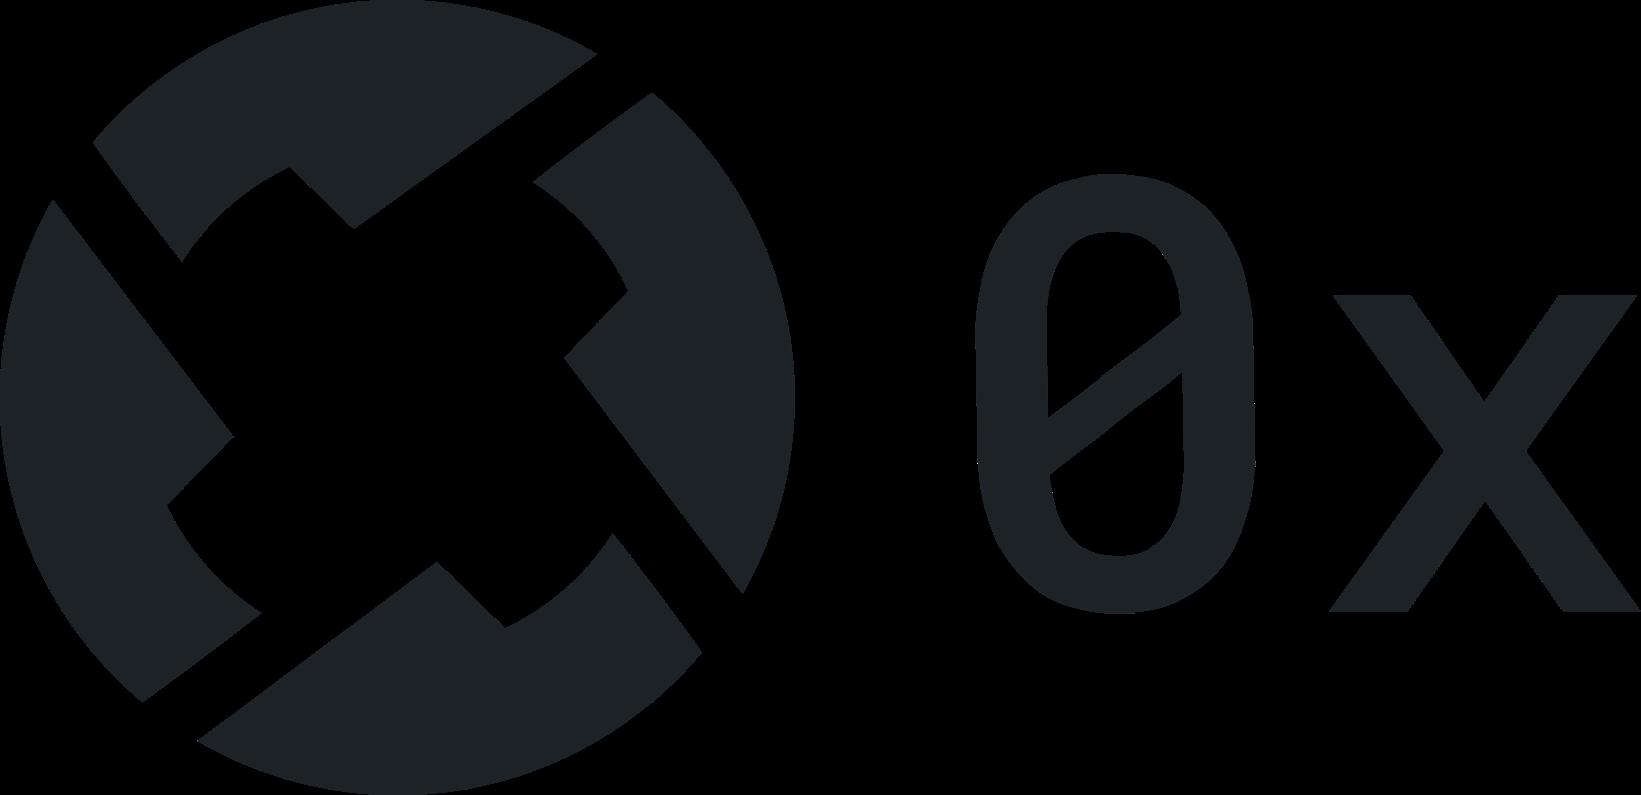 zrx 0x logo